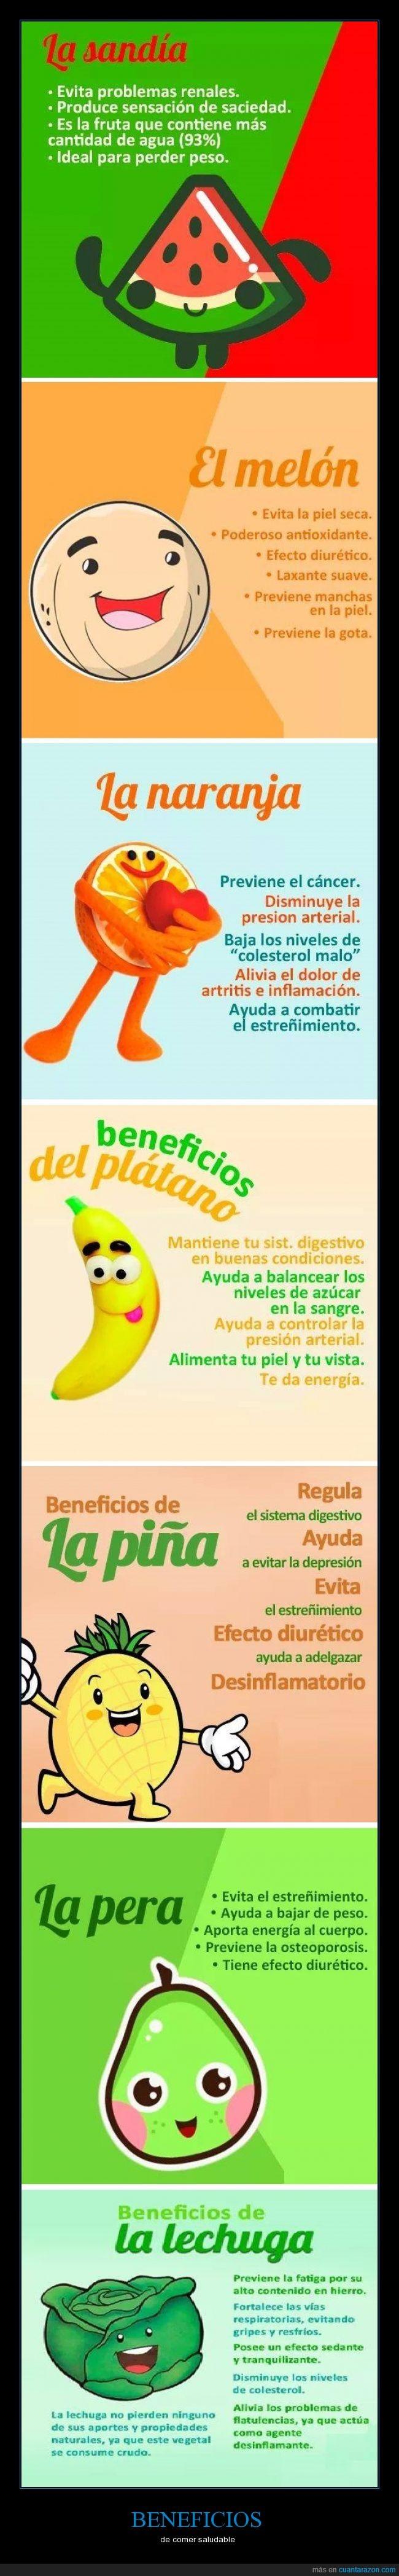 beneficios,col,fruta,lechuga,naranja,pera,platano,saludable,sandia,verdura